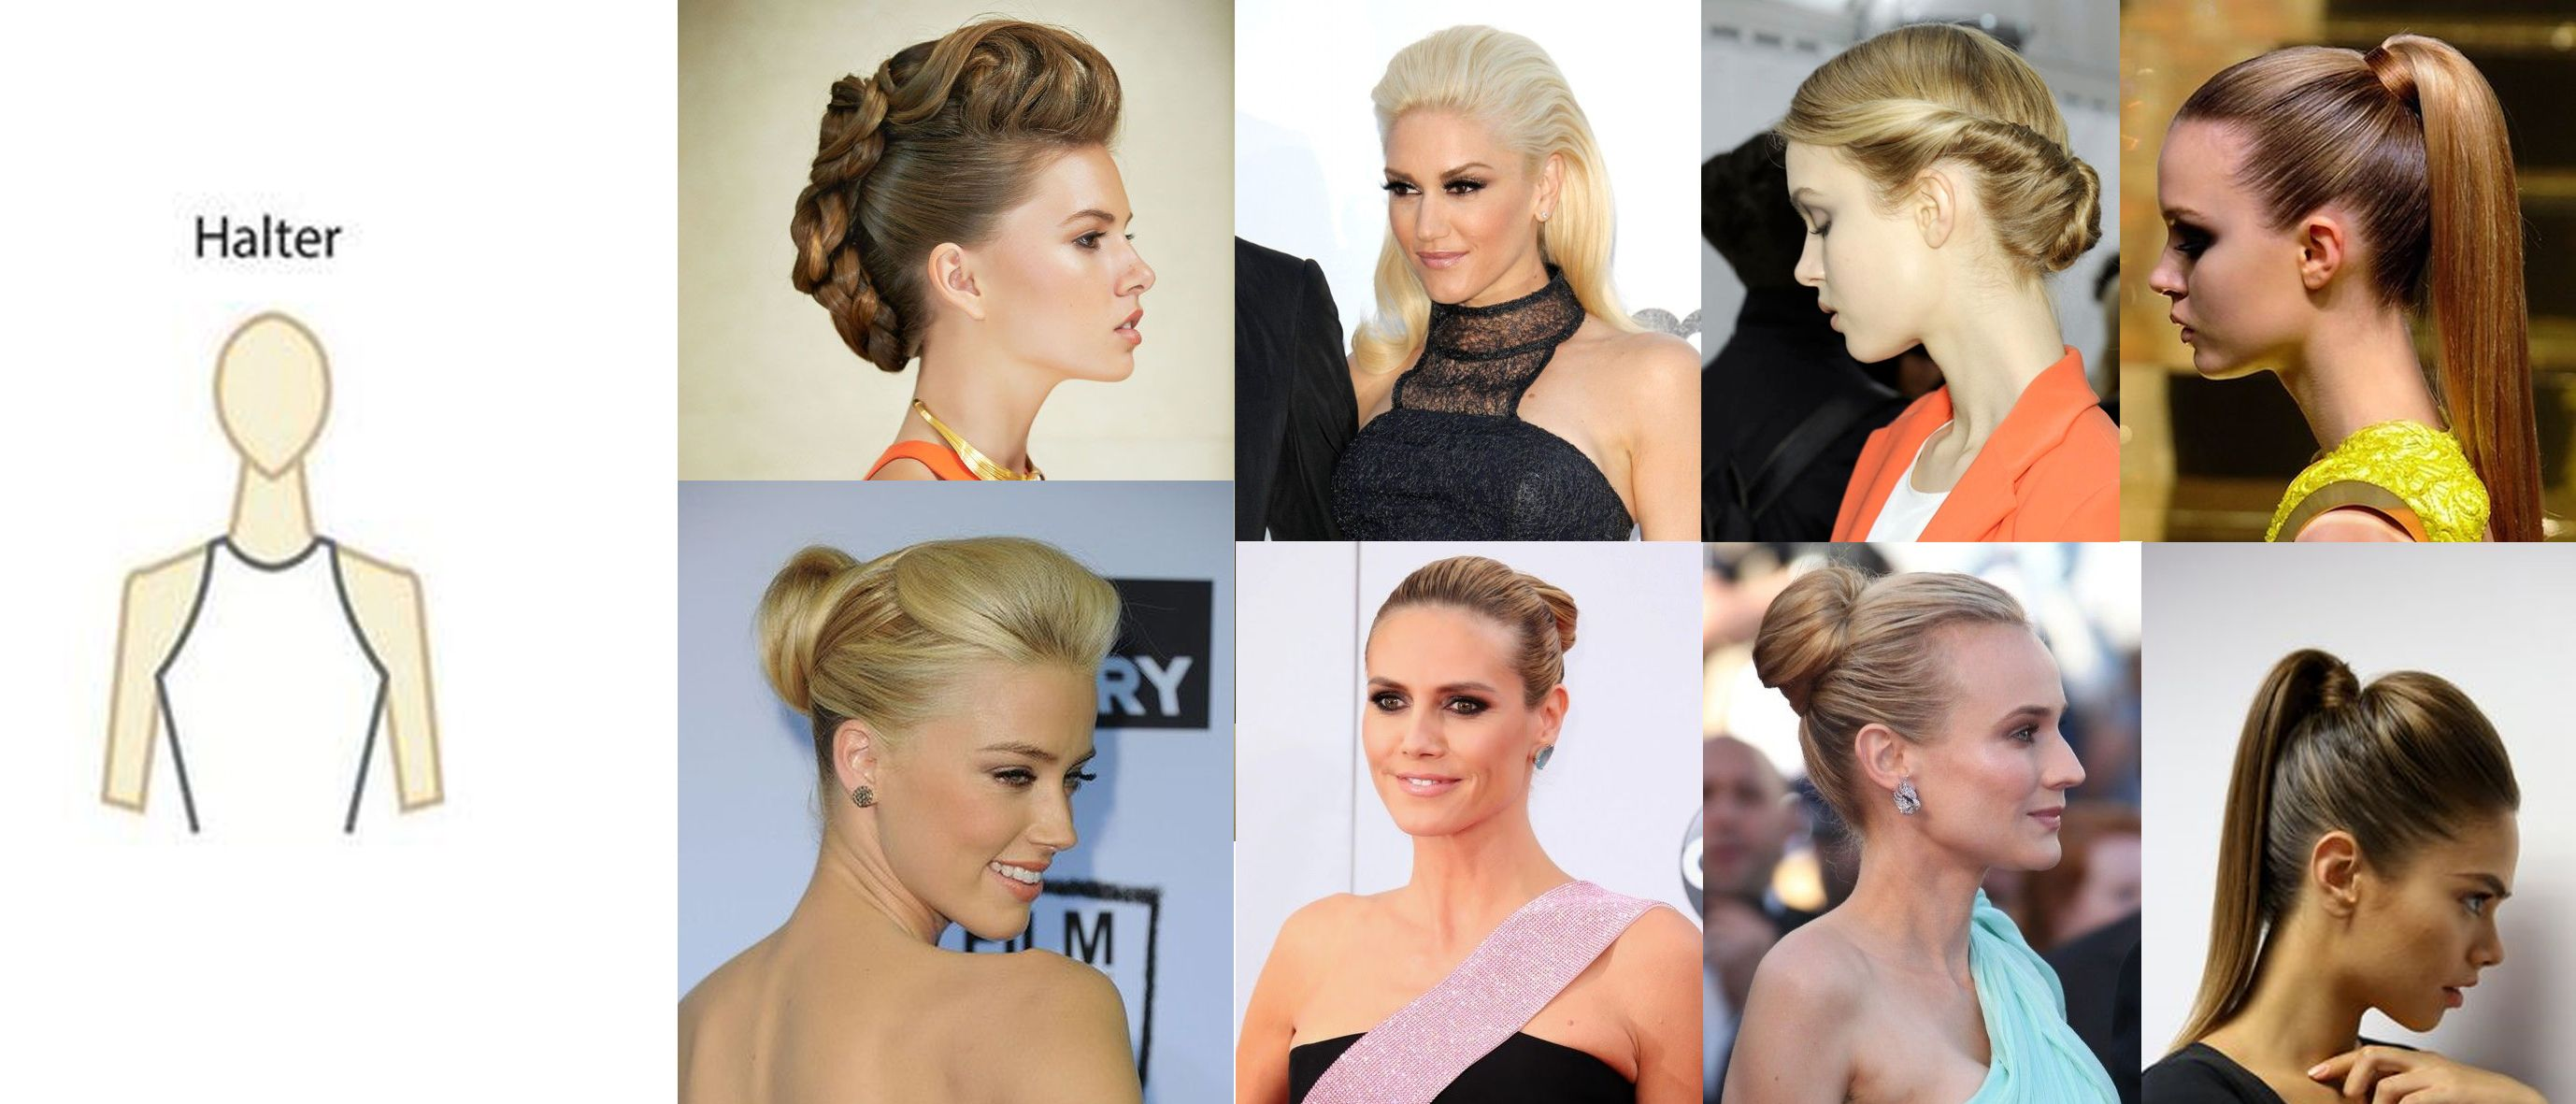 halter neck 2 dress hairstyles - google search | hair